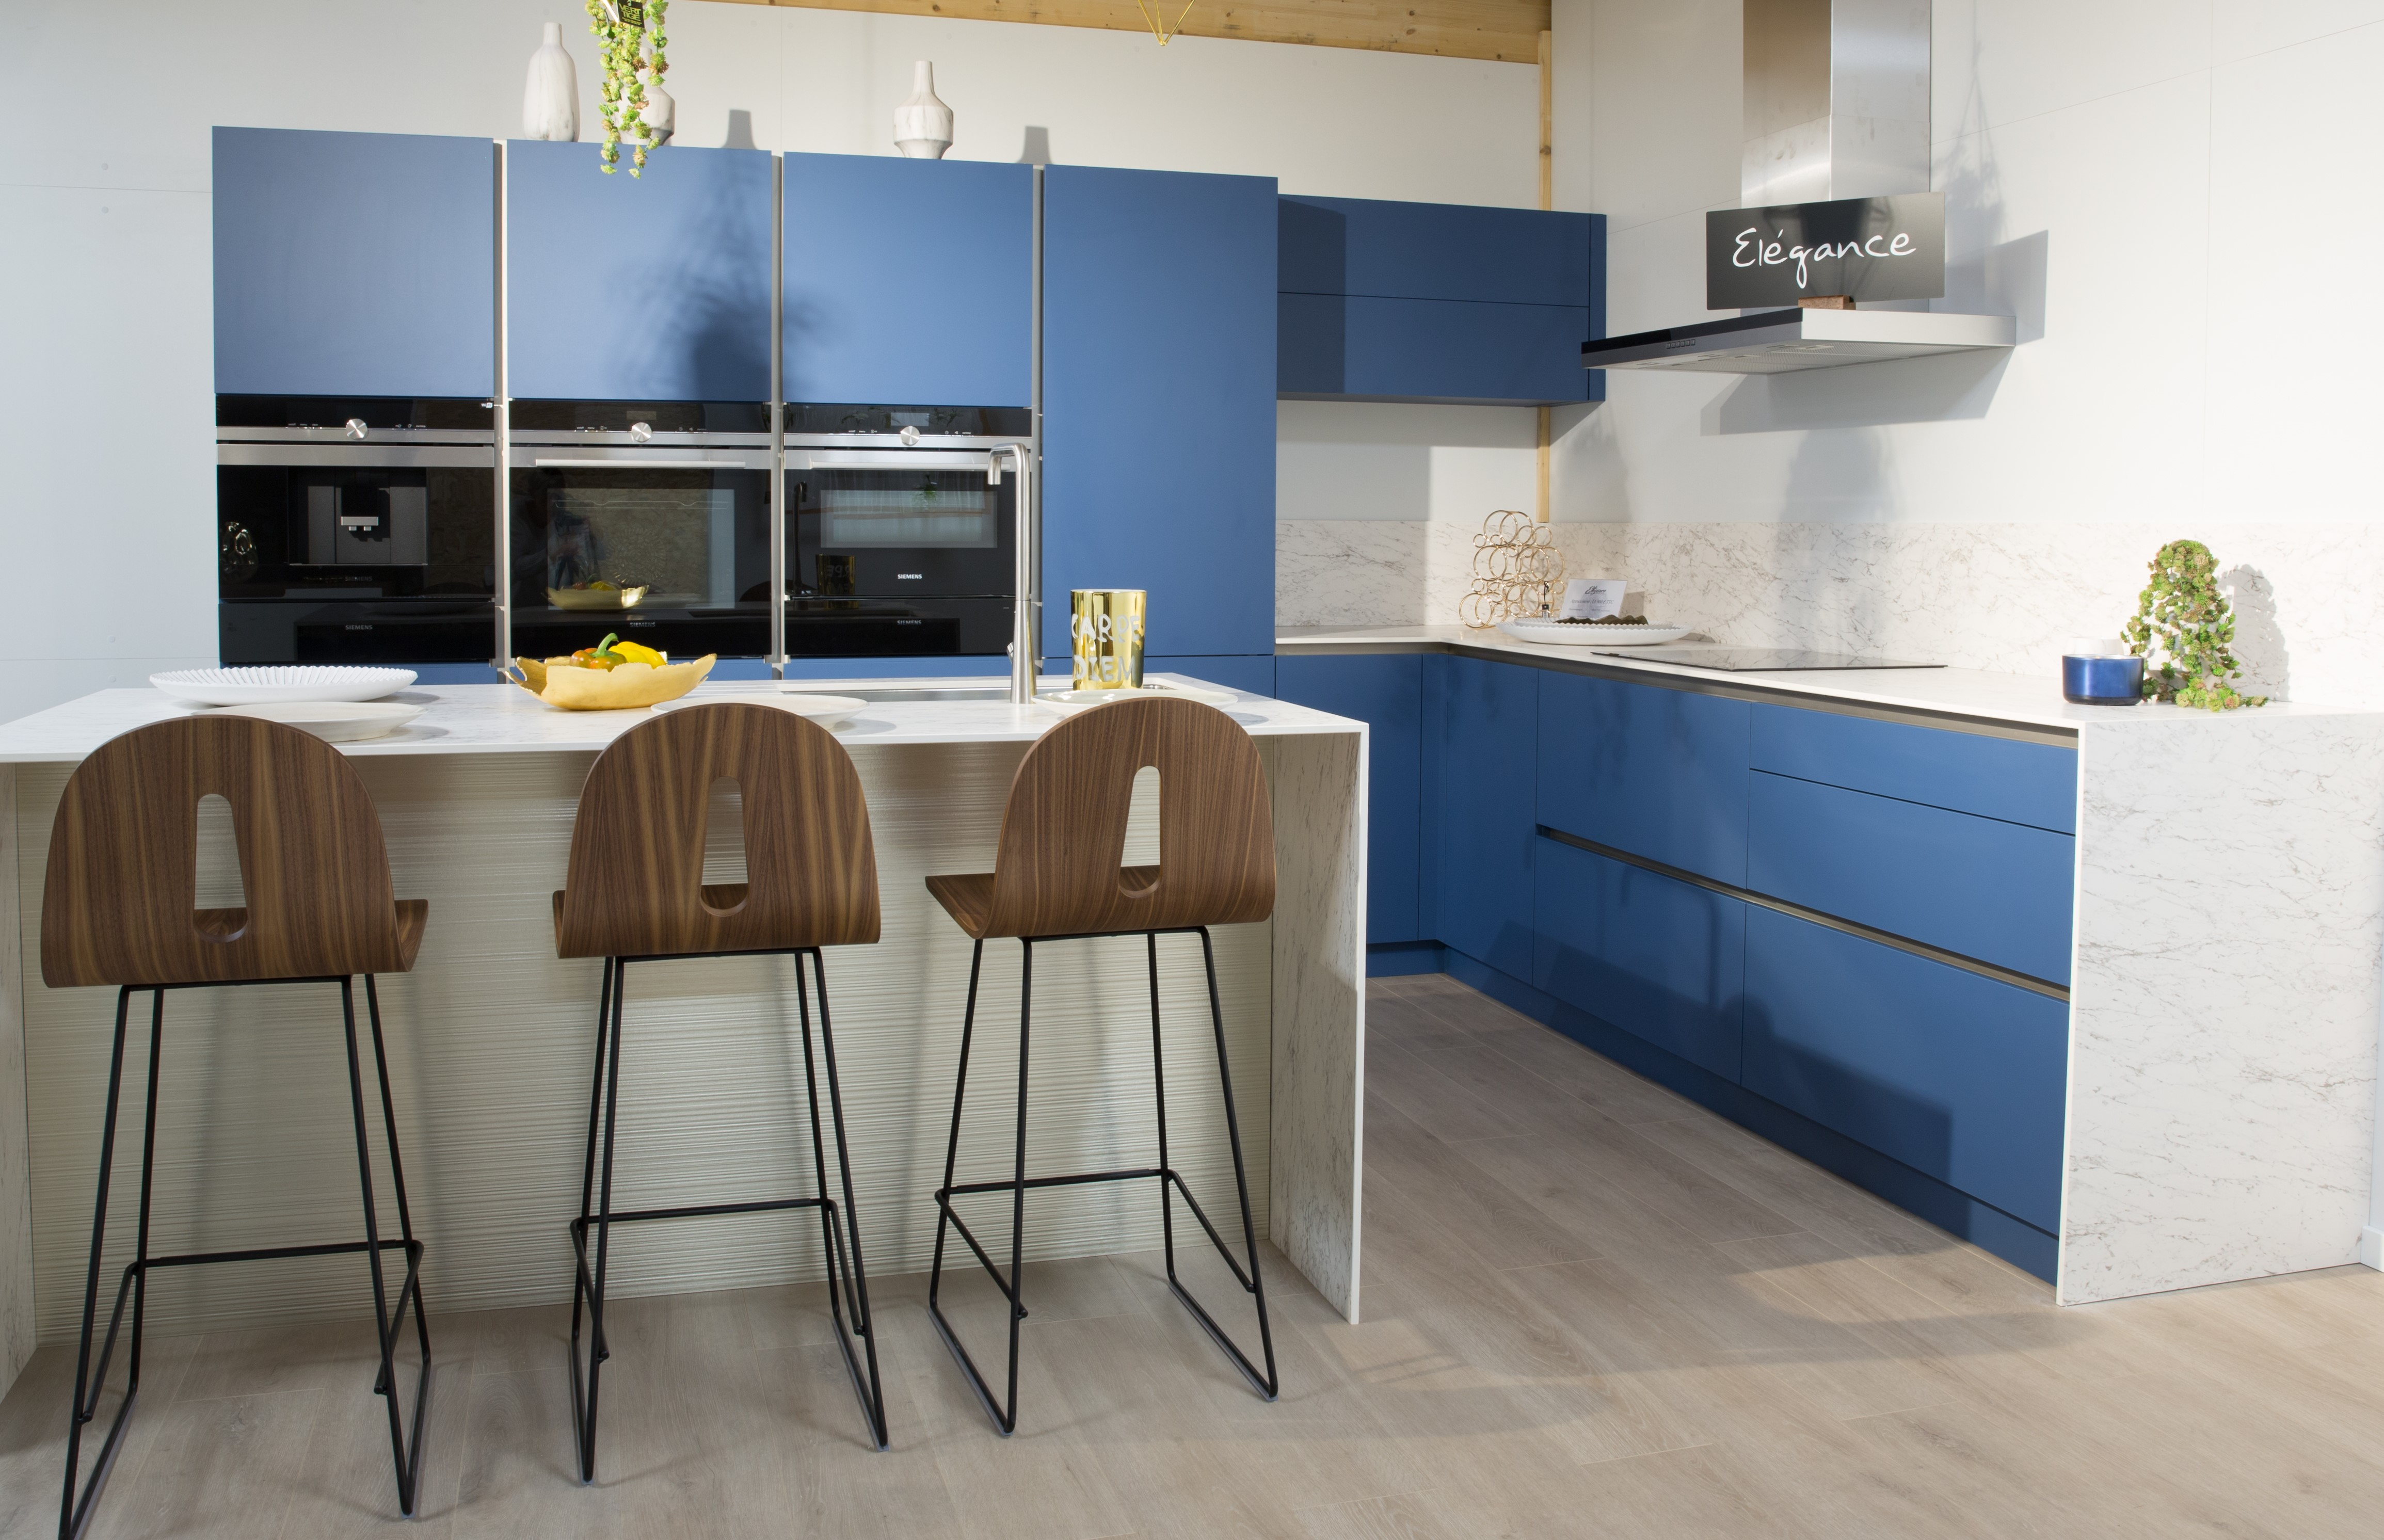 noxi-cuisine-ilot-bleu